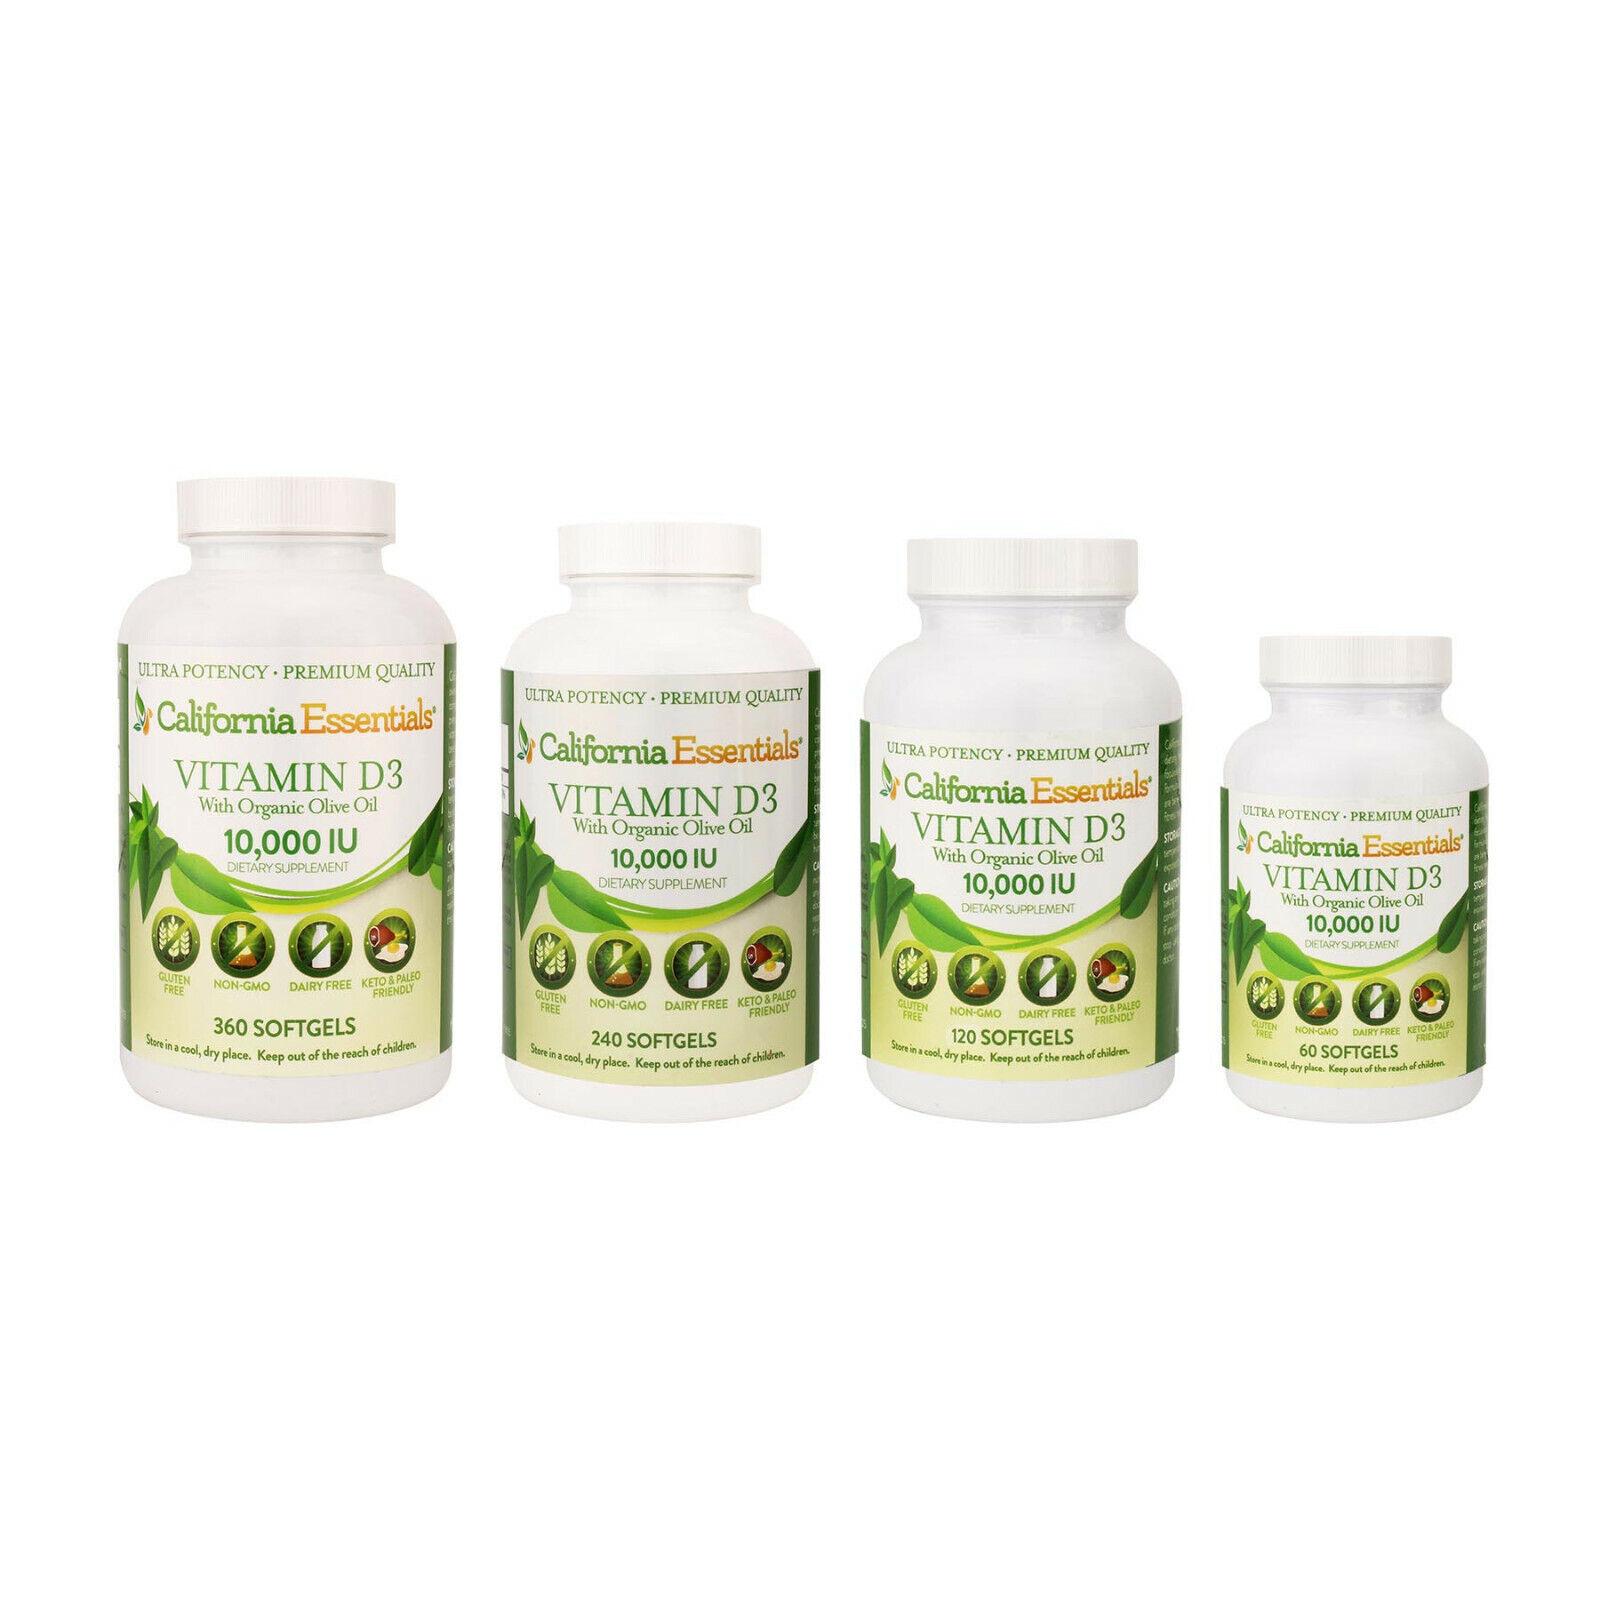 Vitamin D3 10000 IU with Organic Olive Oil Softgels Vit D3 G